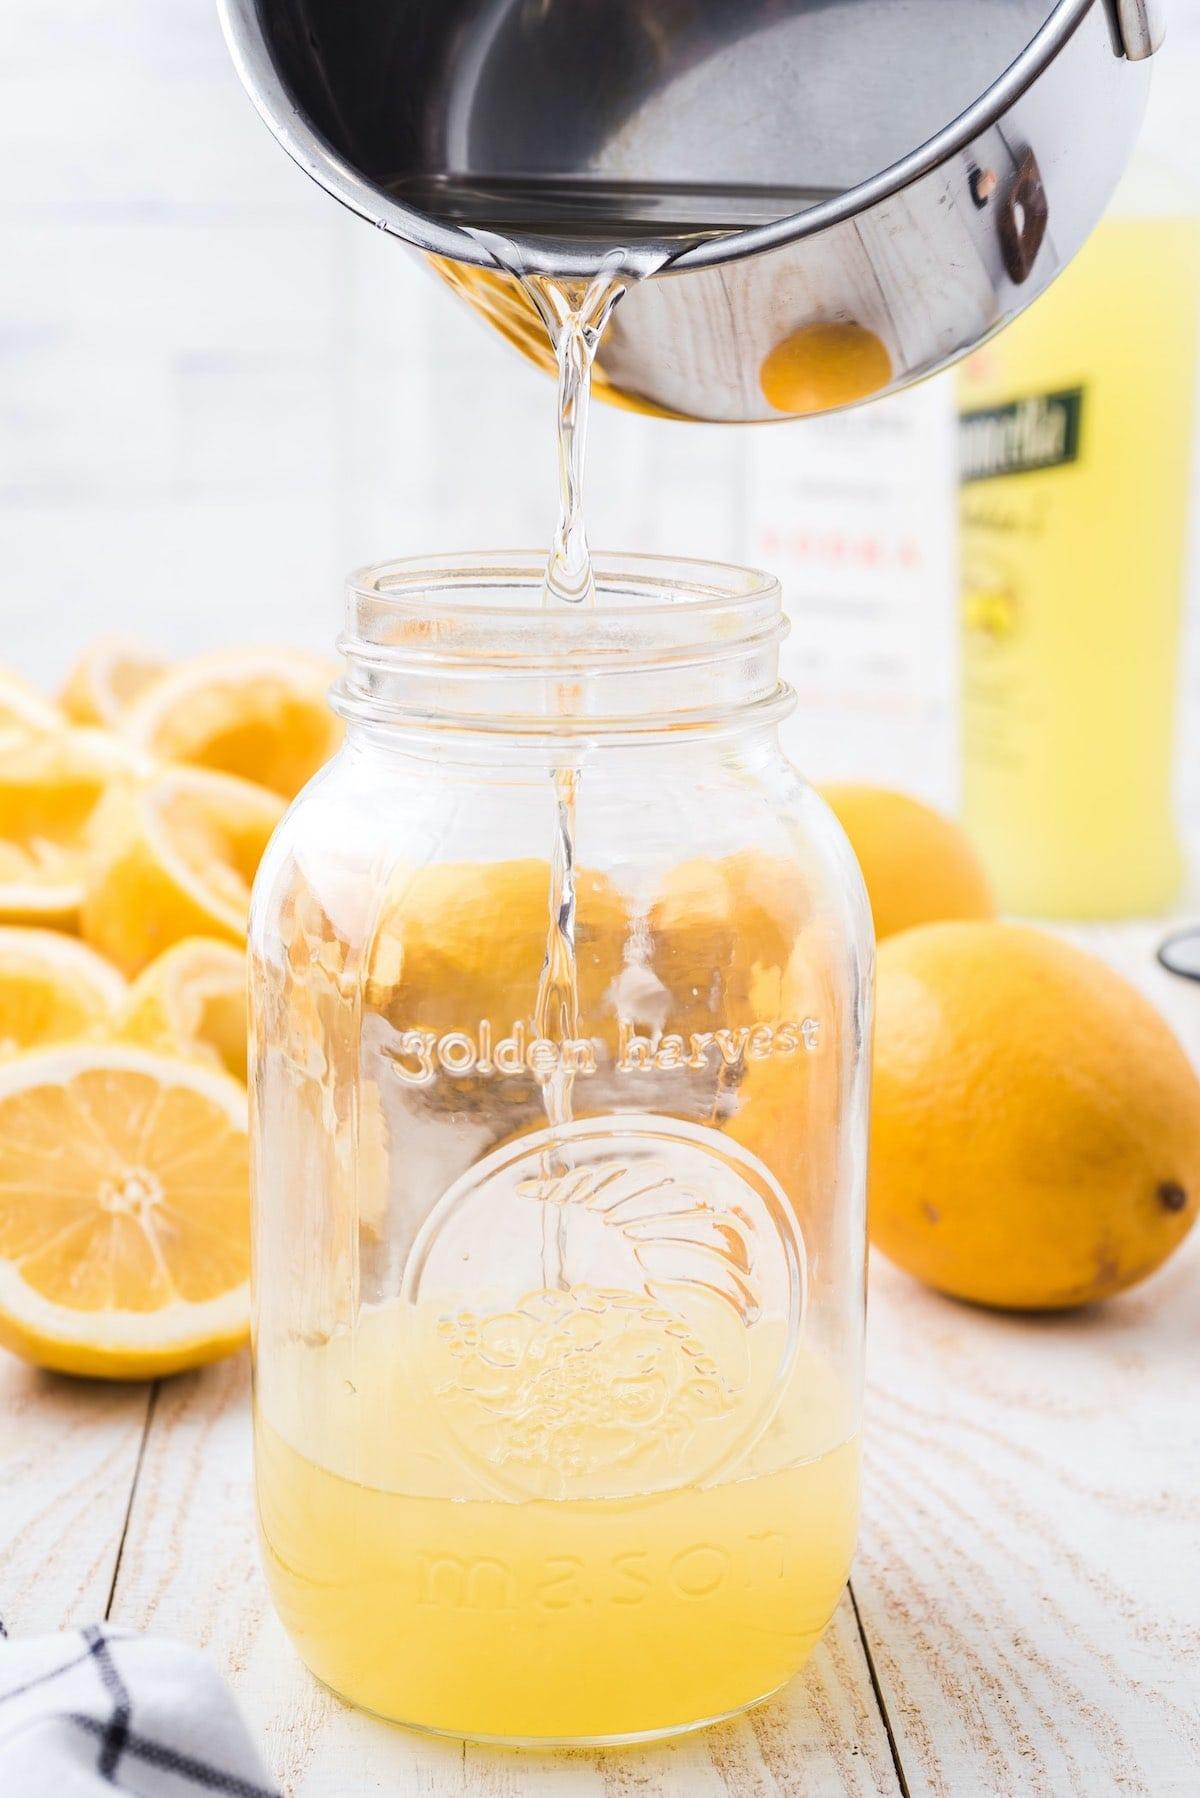 pouring the sugar mixture into the mason jar